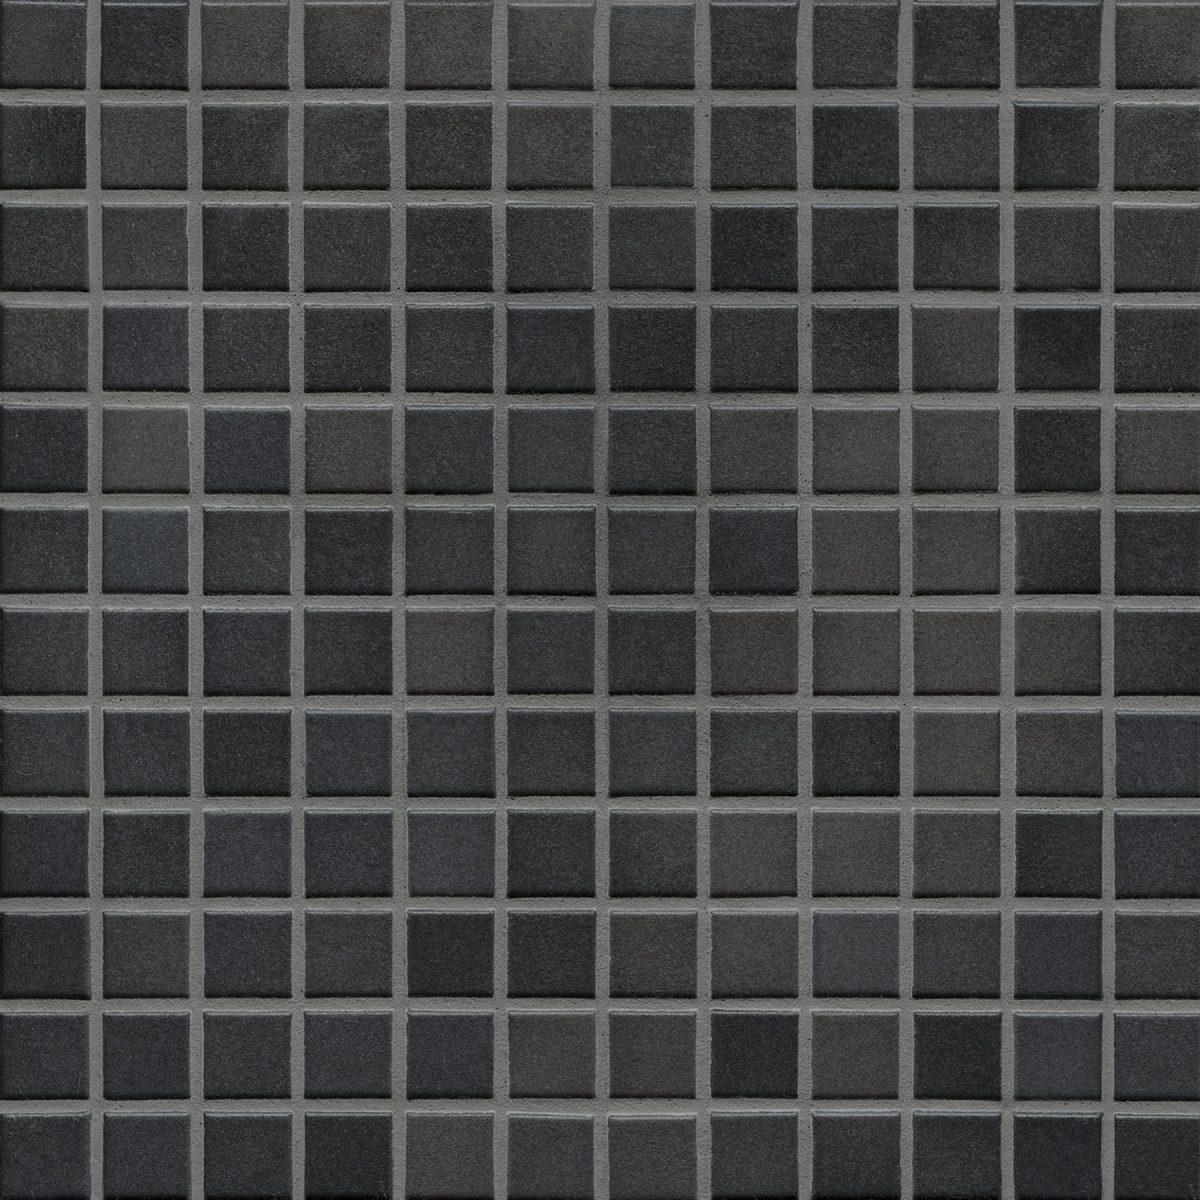 Мозаика серия Fresh 2,4 X 2,4 см Midnight Black Mix Secura (противоскользящая R10/B)